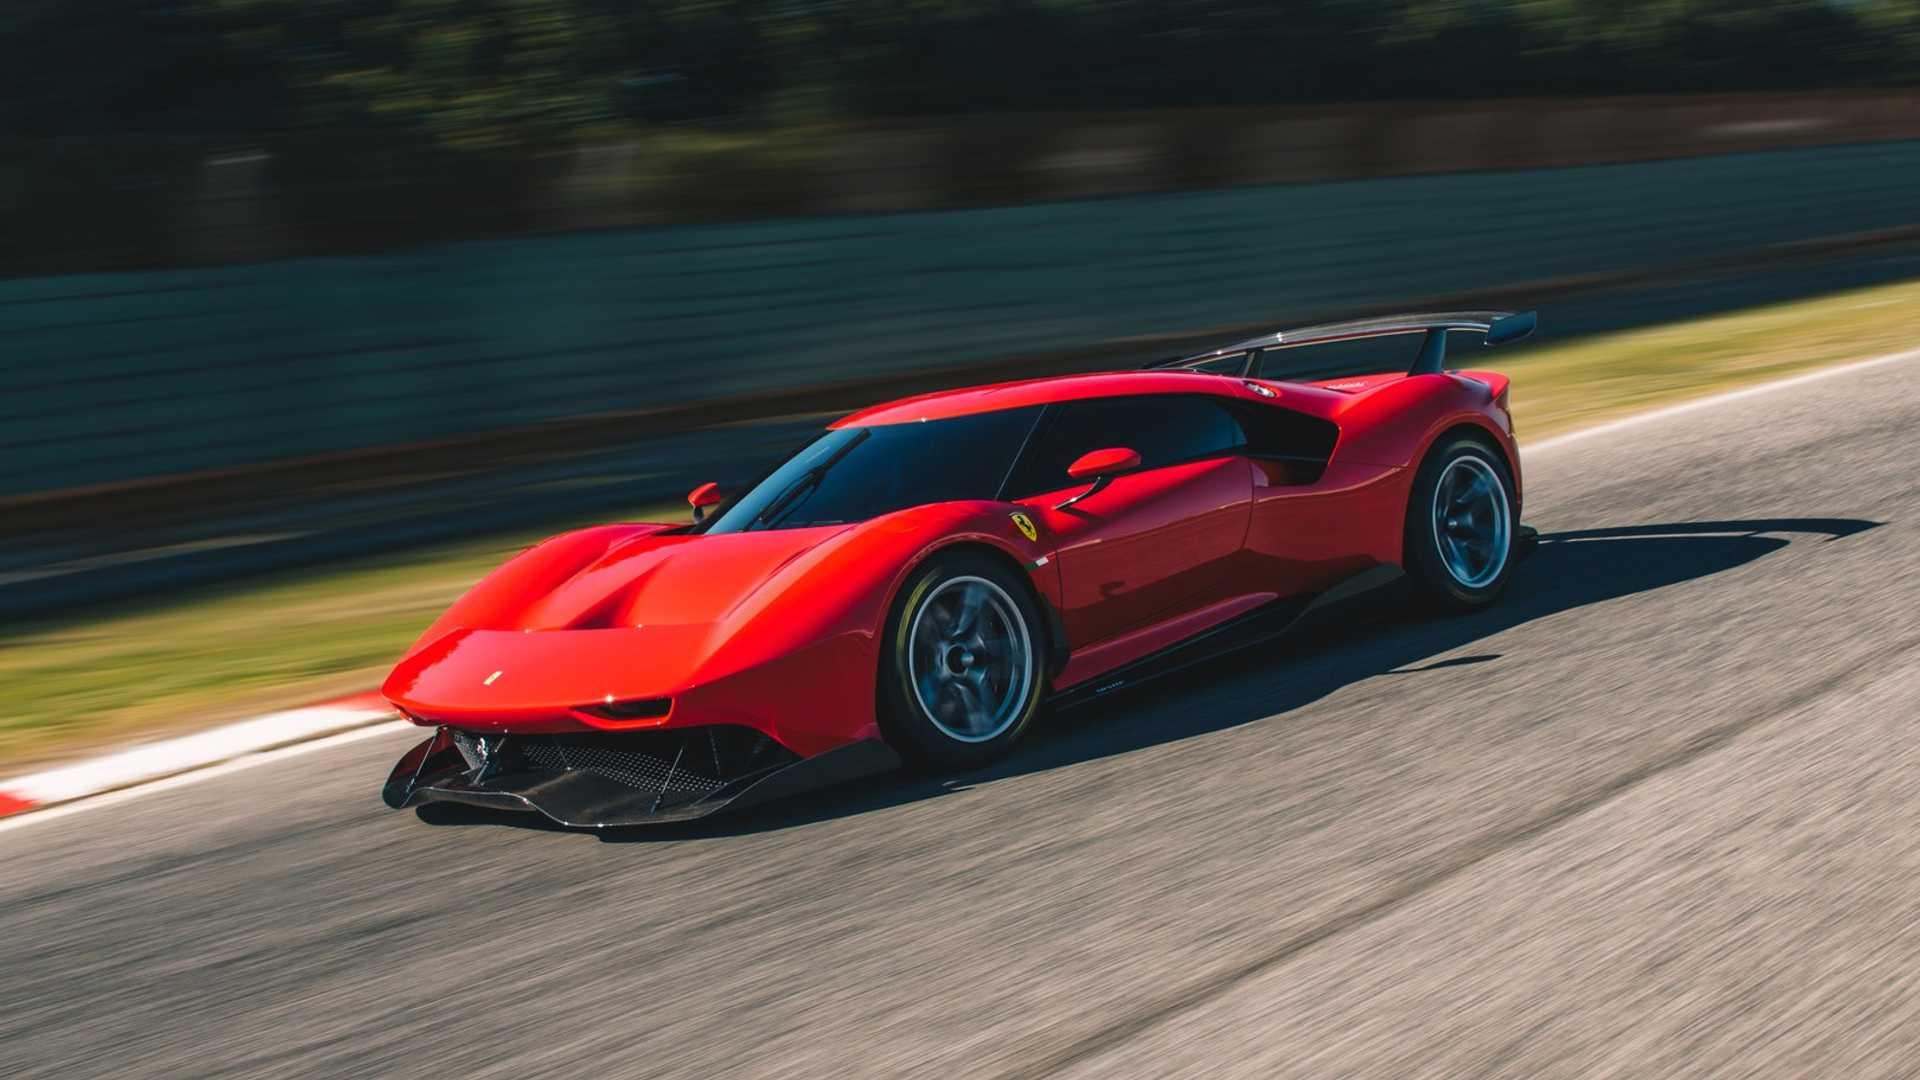 Ferrari SP48 Unica